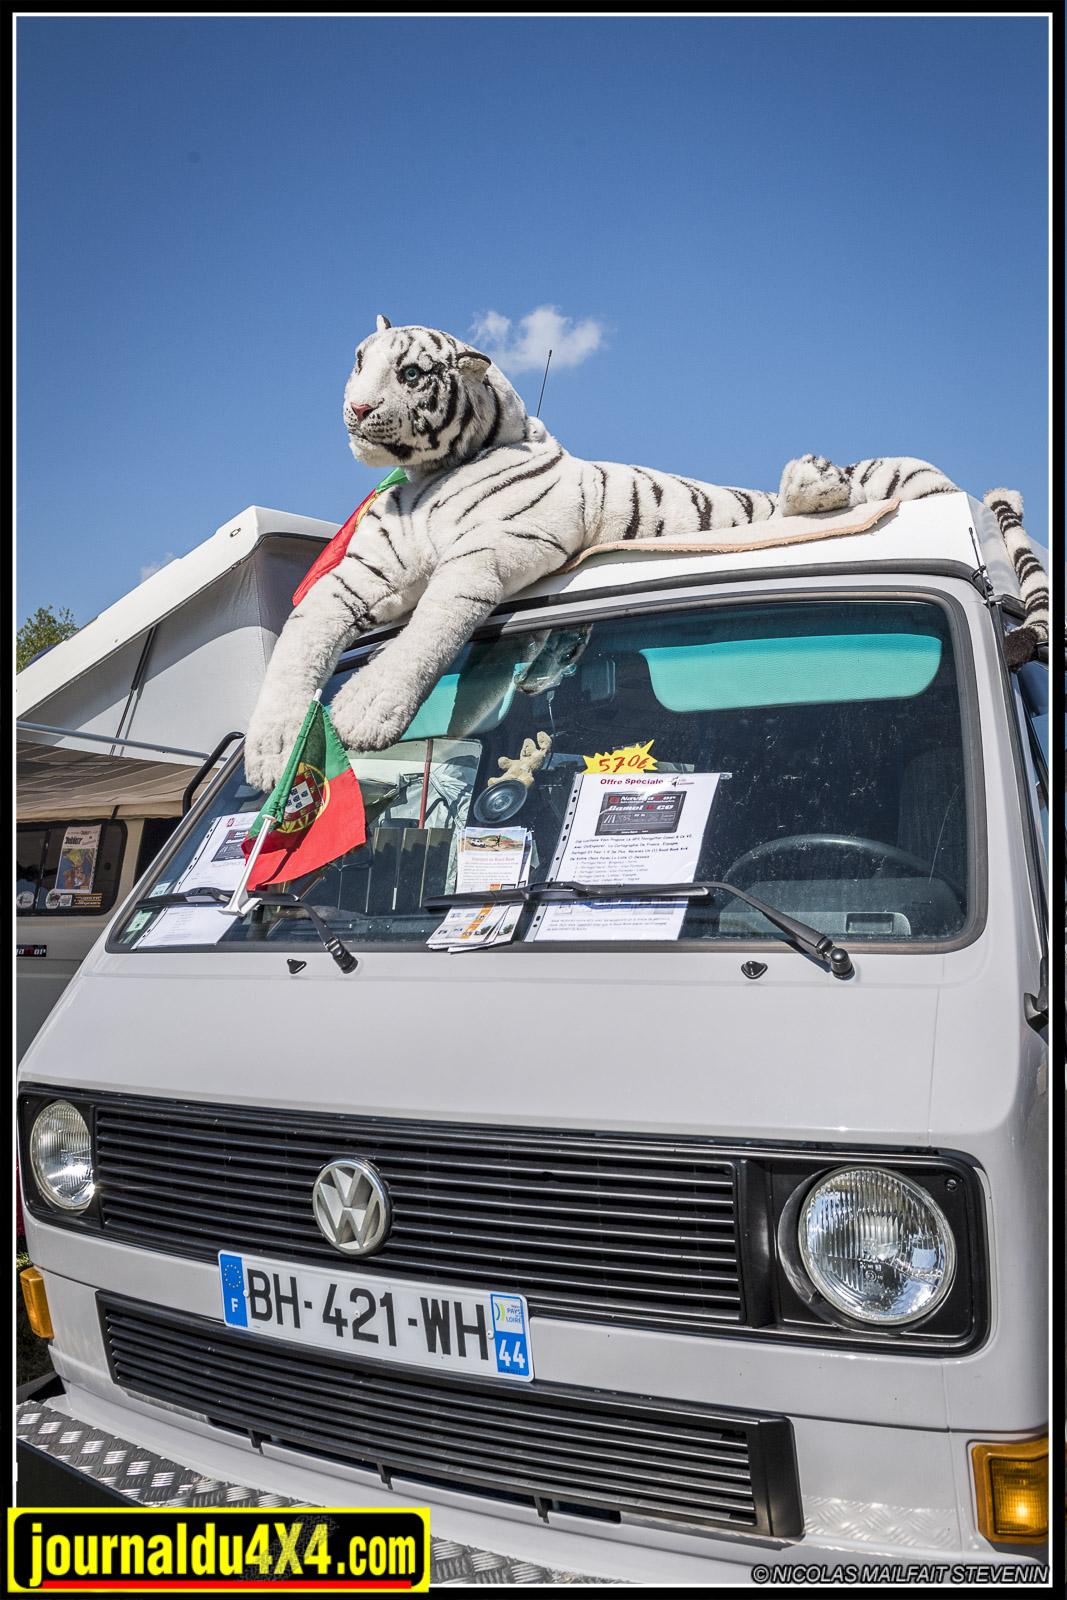 Un tigre se repose au soleil